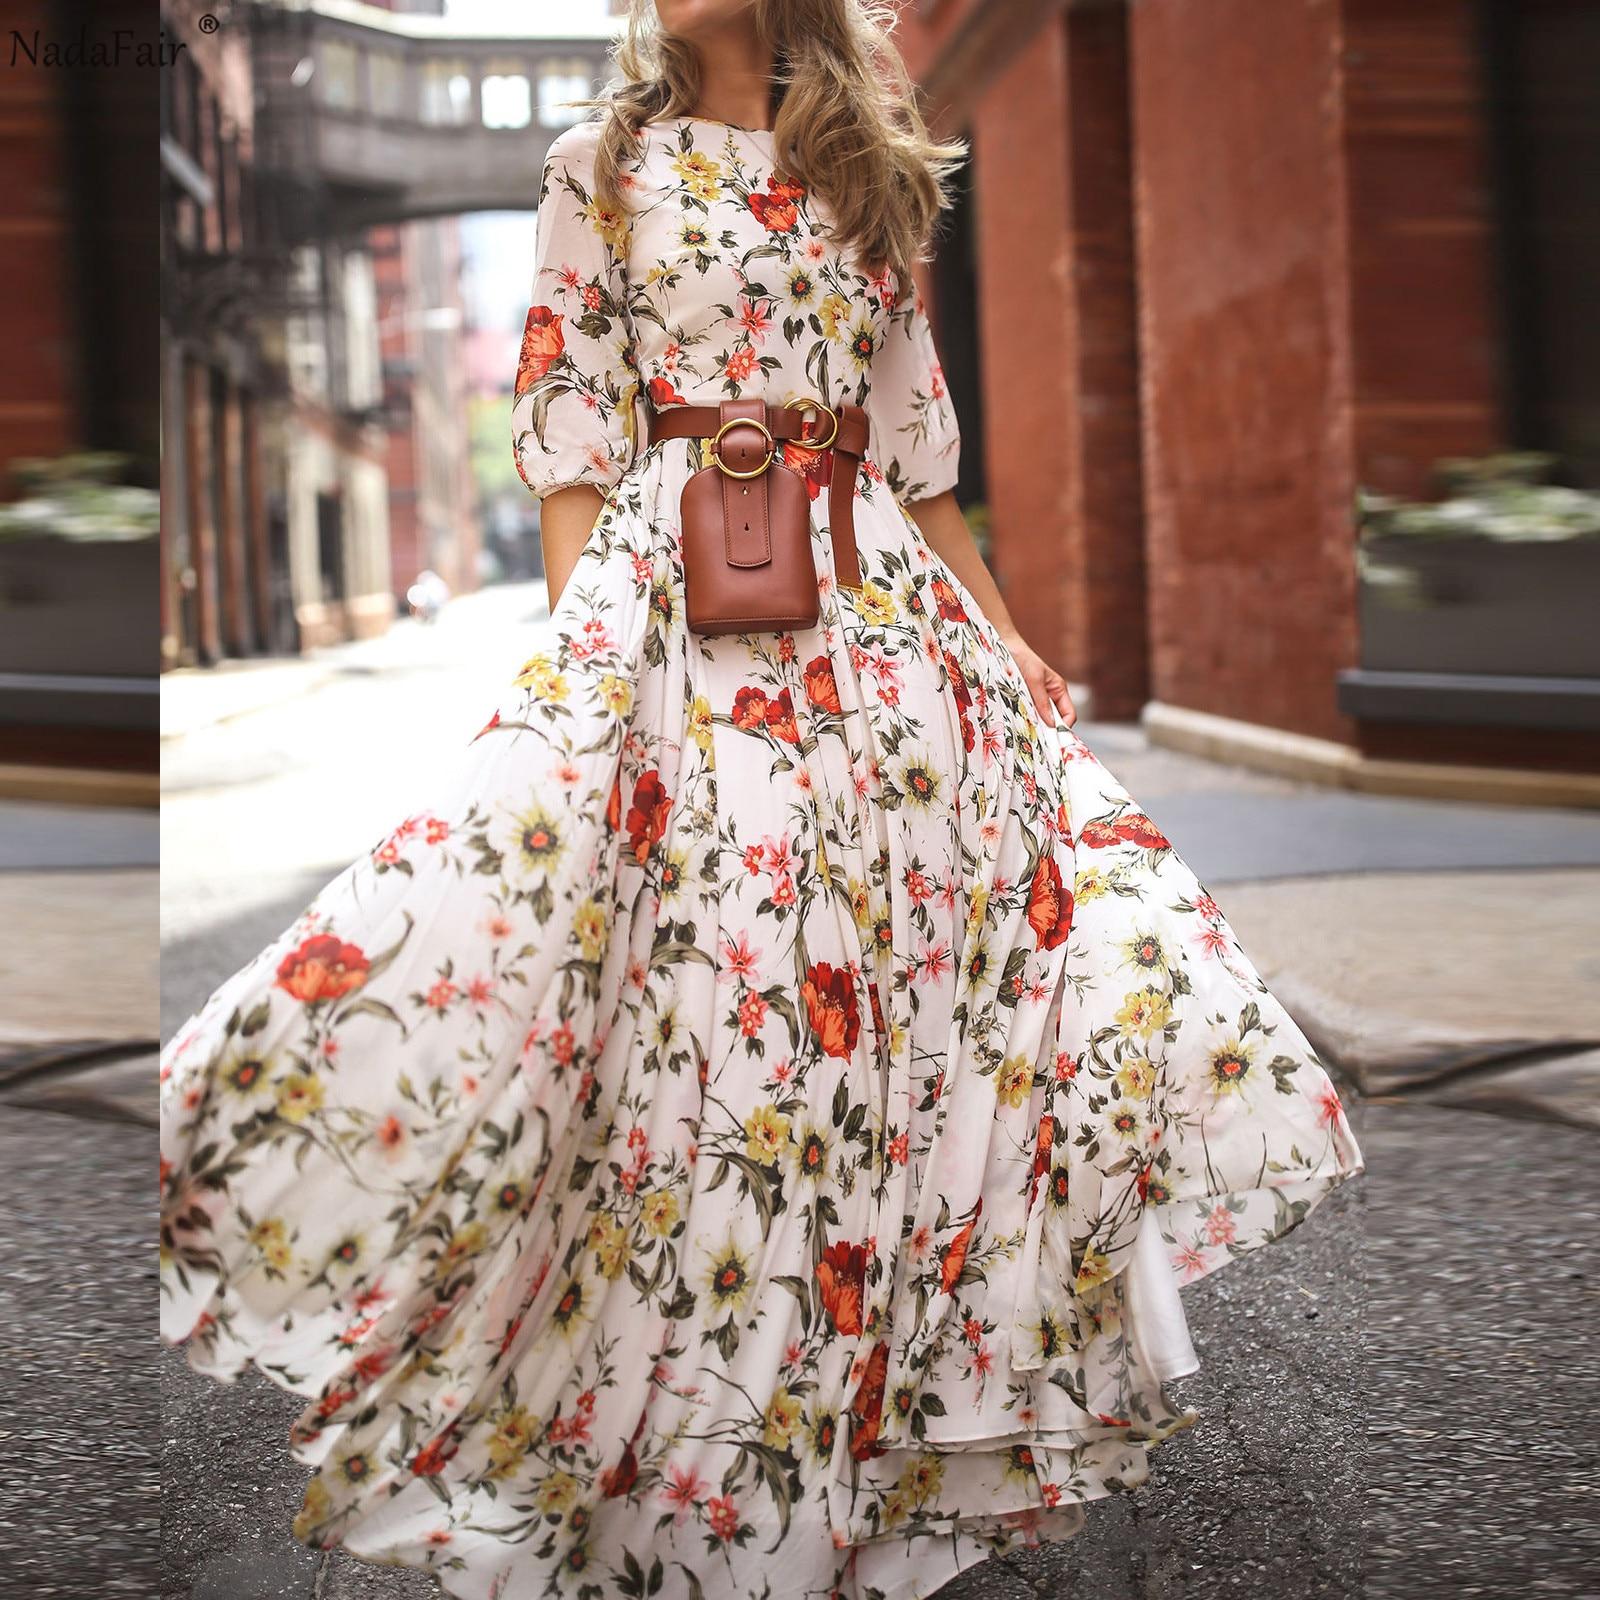 Nadafair Boho Floral Maxi Dress Woman Plus Size High Waist O Neck Printed Elegant Summer Beach Long Dresses Female Vestidos